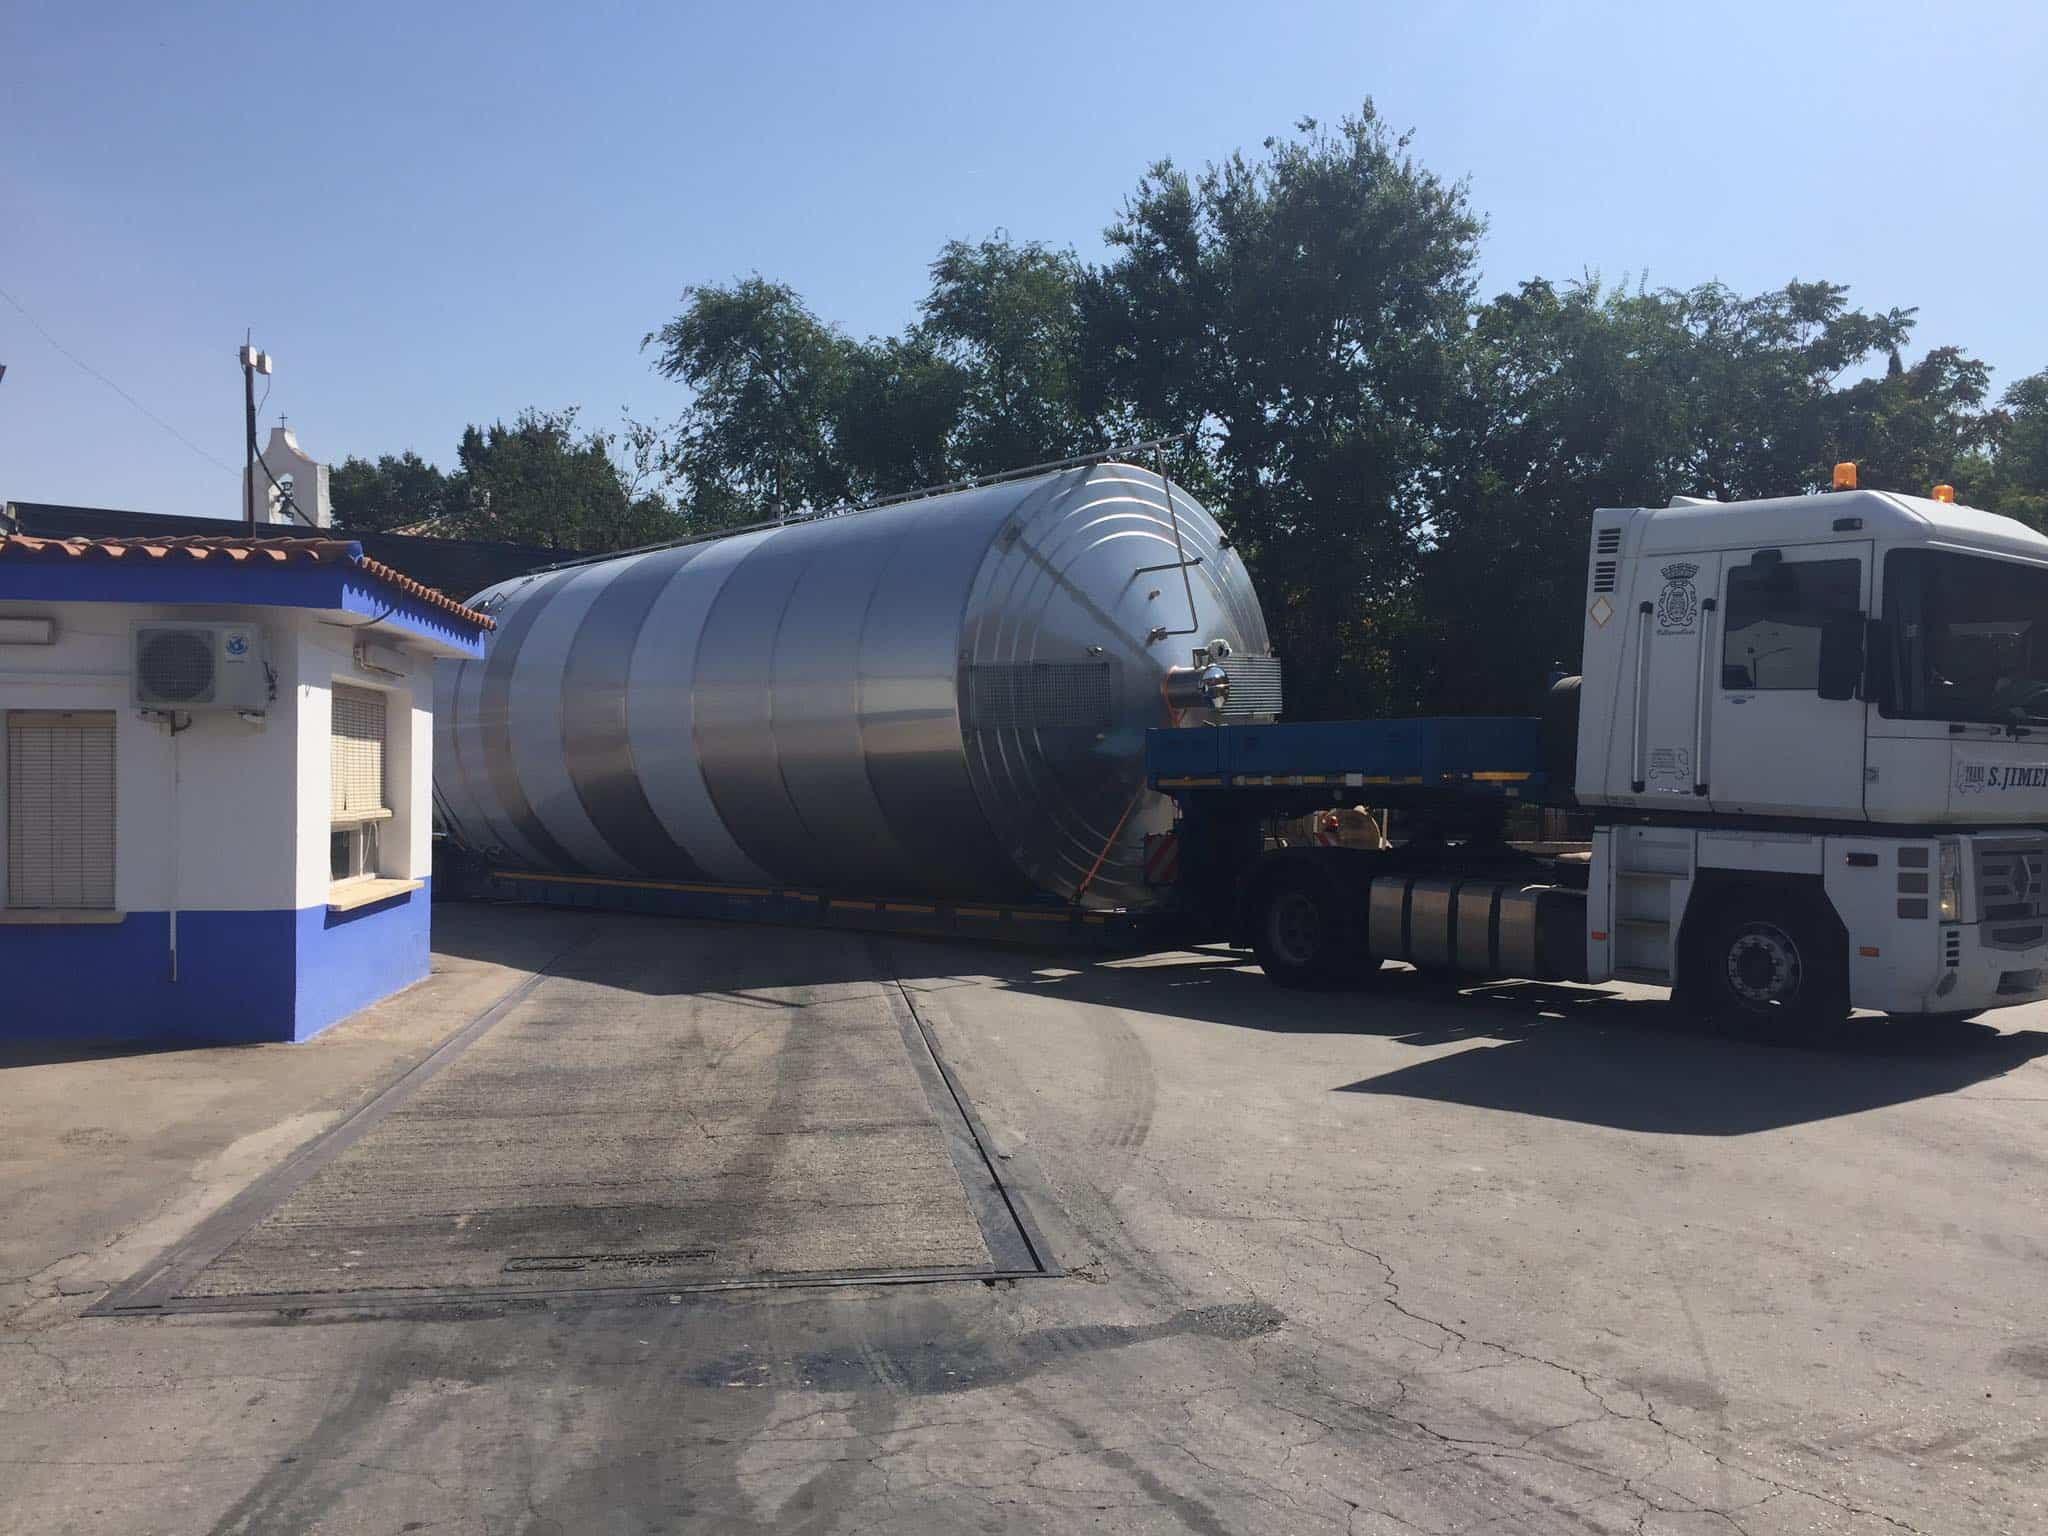 modernizacion bodegas san jose herencia 2 - Bodegas San José mejora y moderniza sus instalaciones